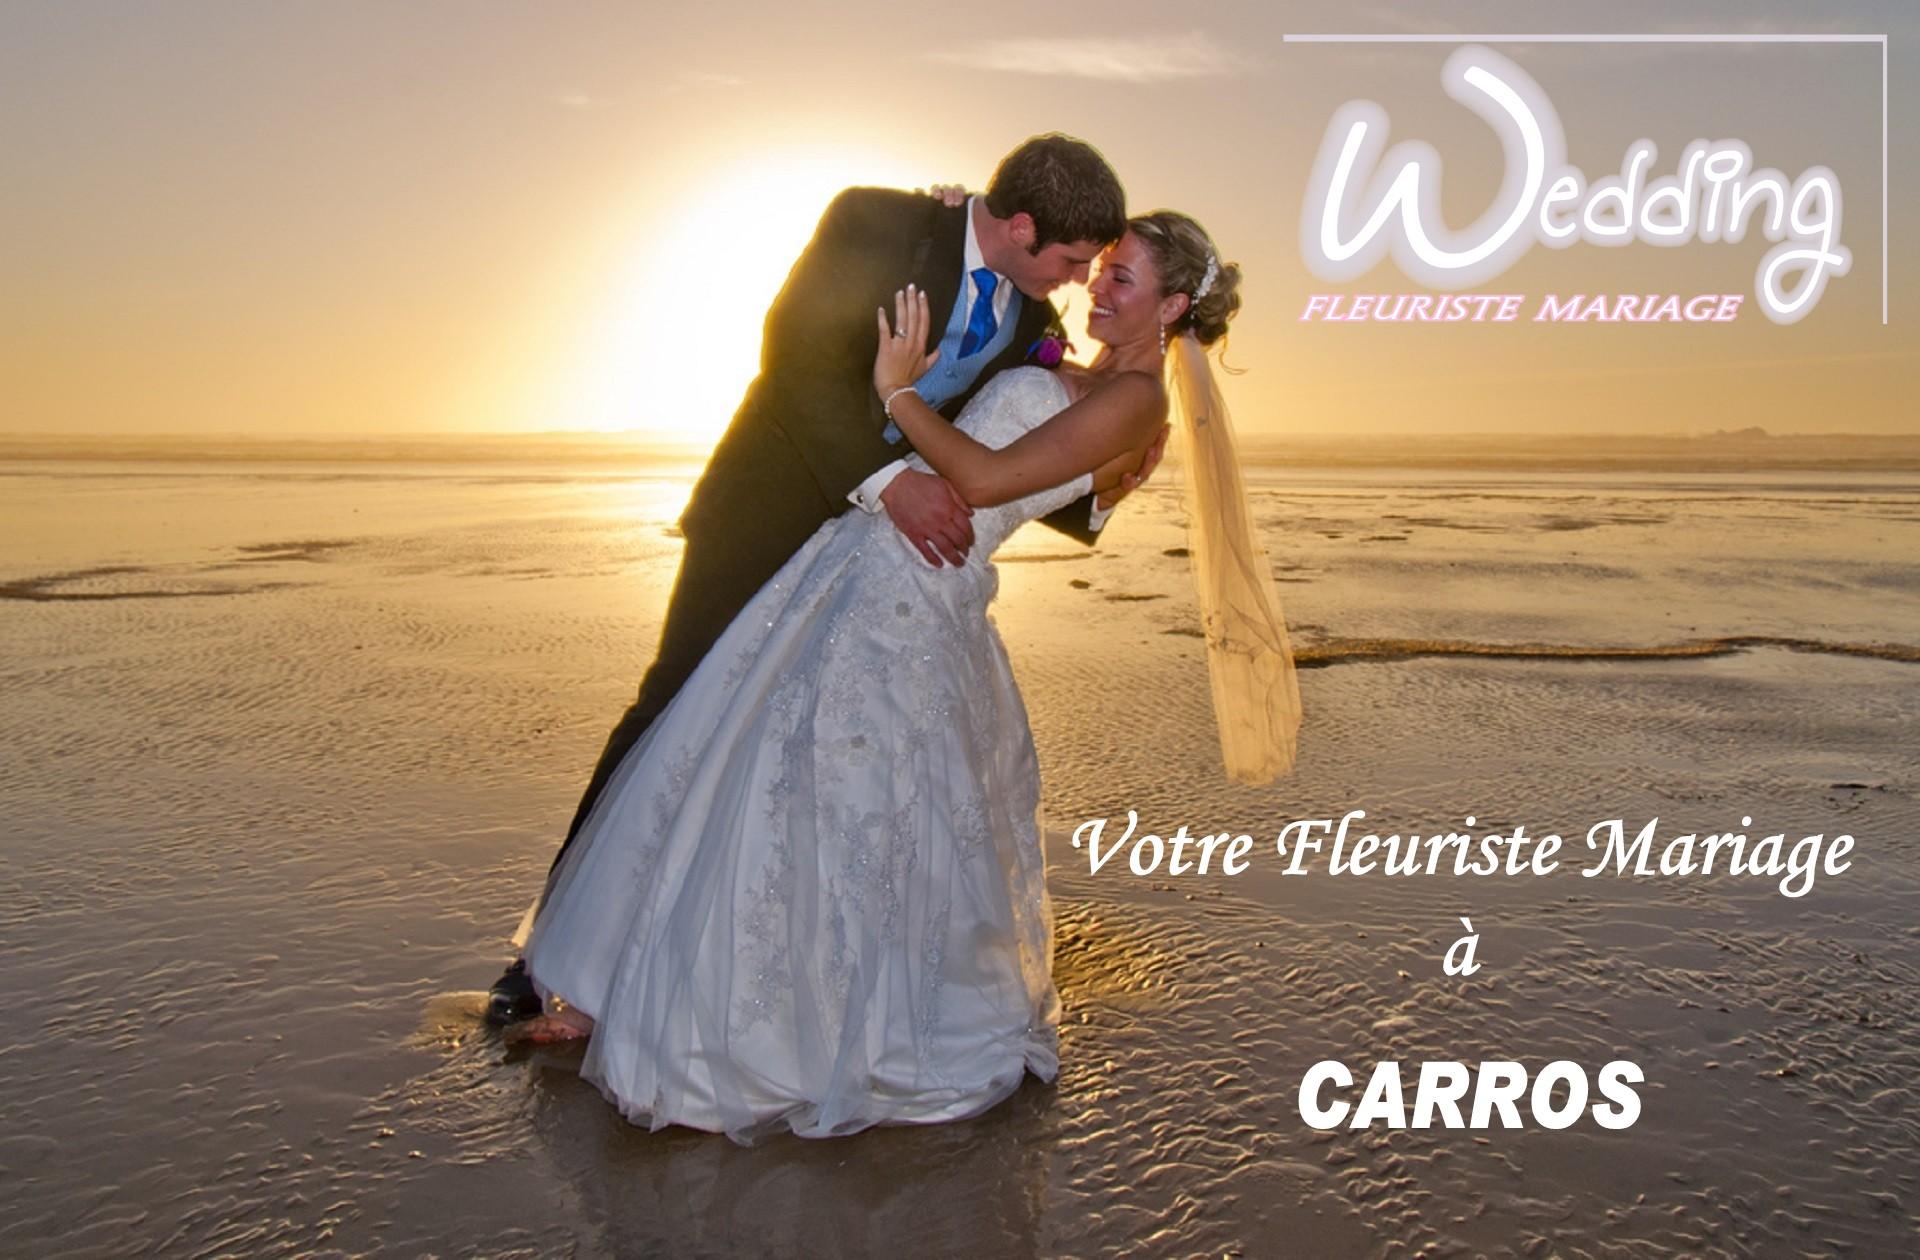 FLEURISTE MARIAGE CARROS - WEDDING PLANNER CARROS - TRAITEUR CARROS